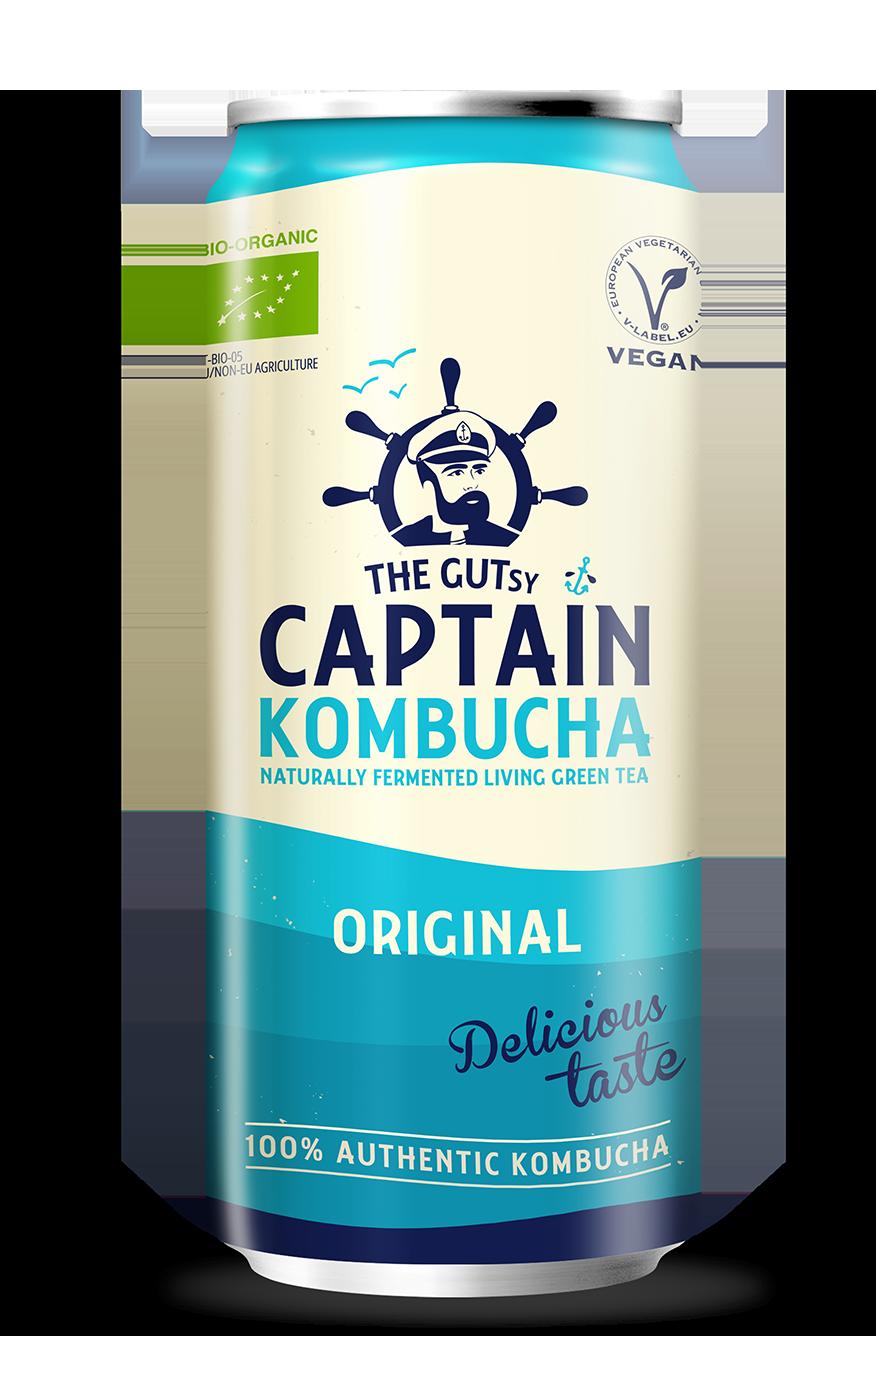 The Gutsy Captain Kombucha Original BIO